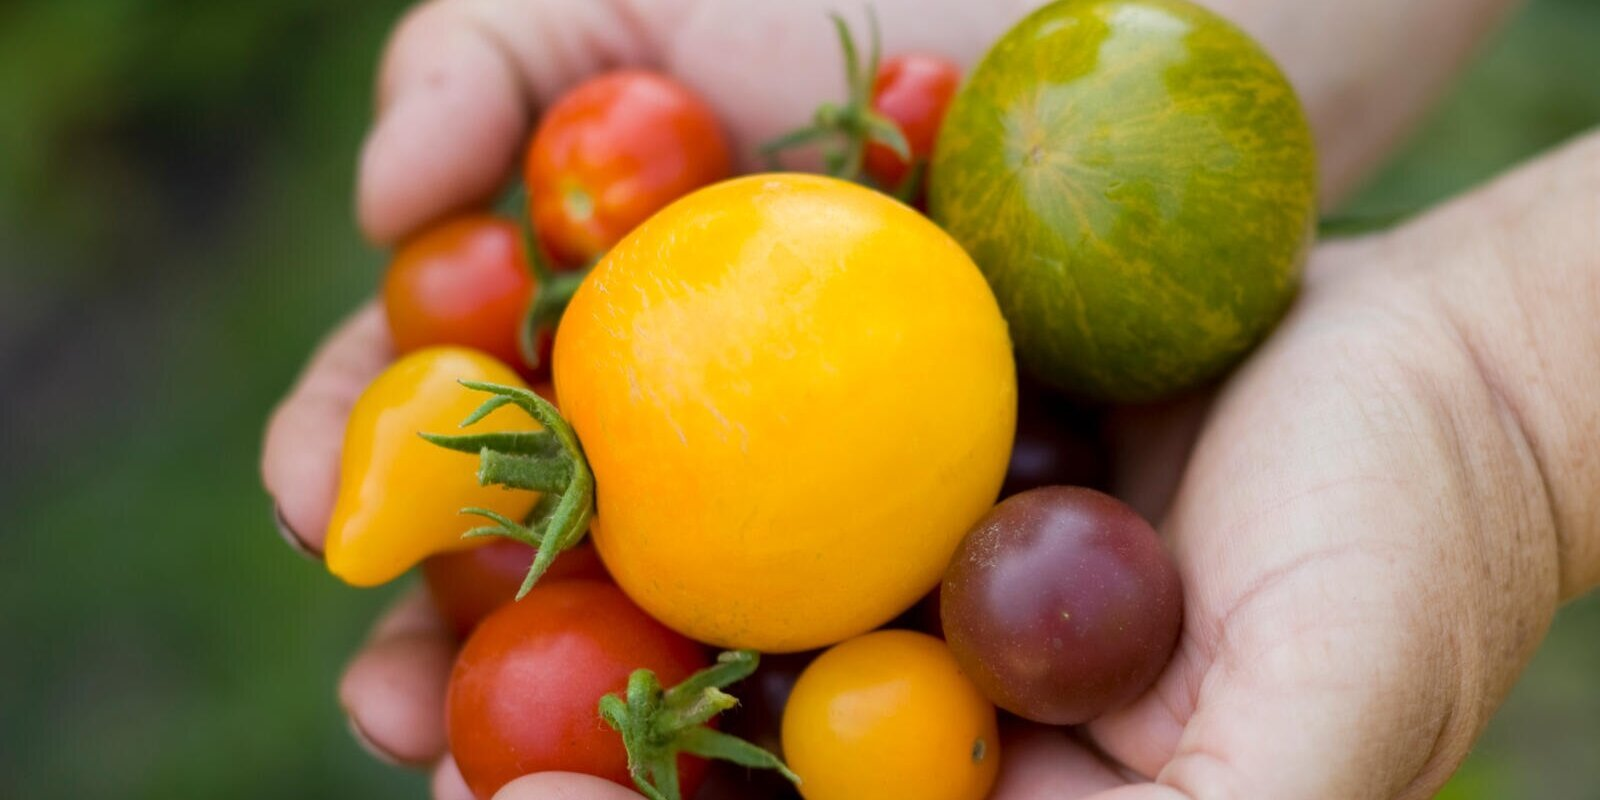 Allrecipes Kitchen Garden Guide - cover